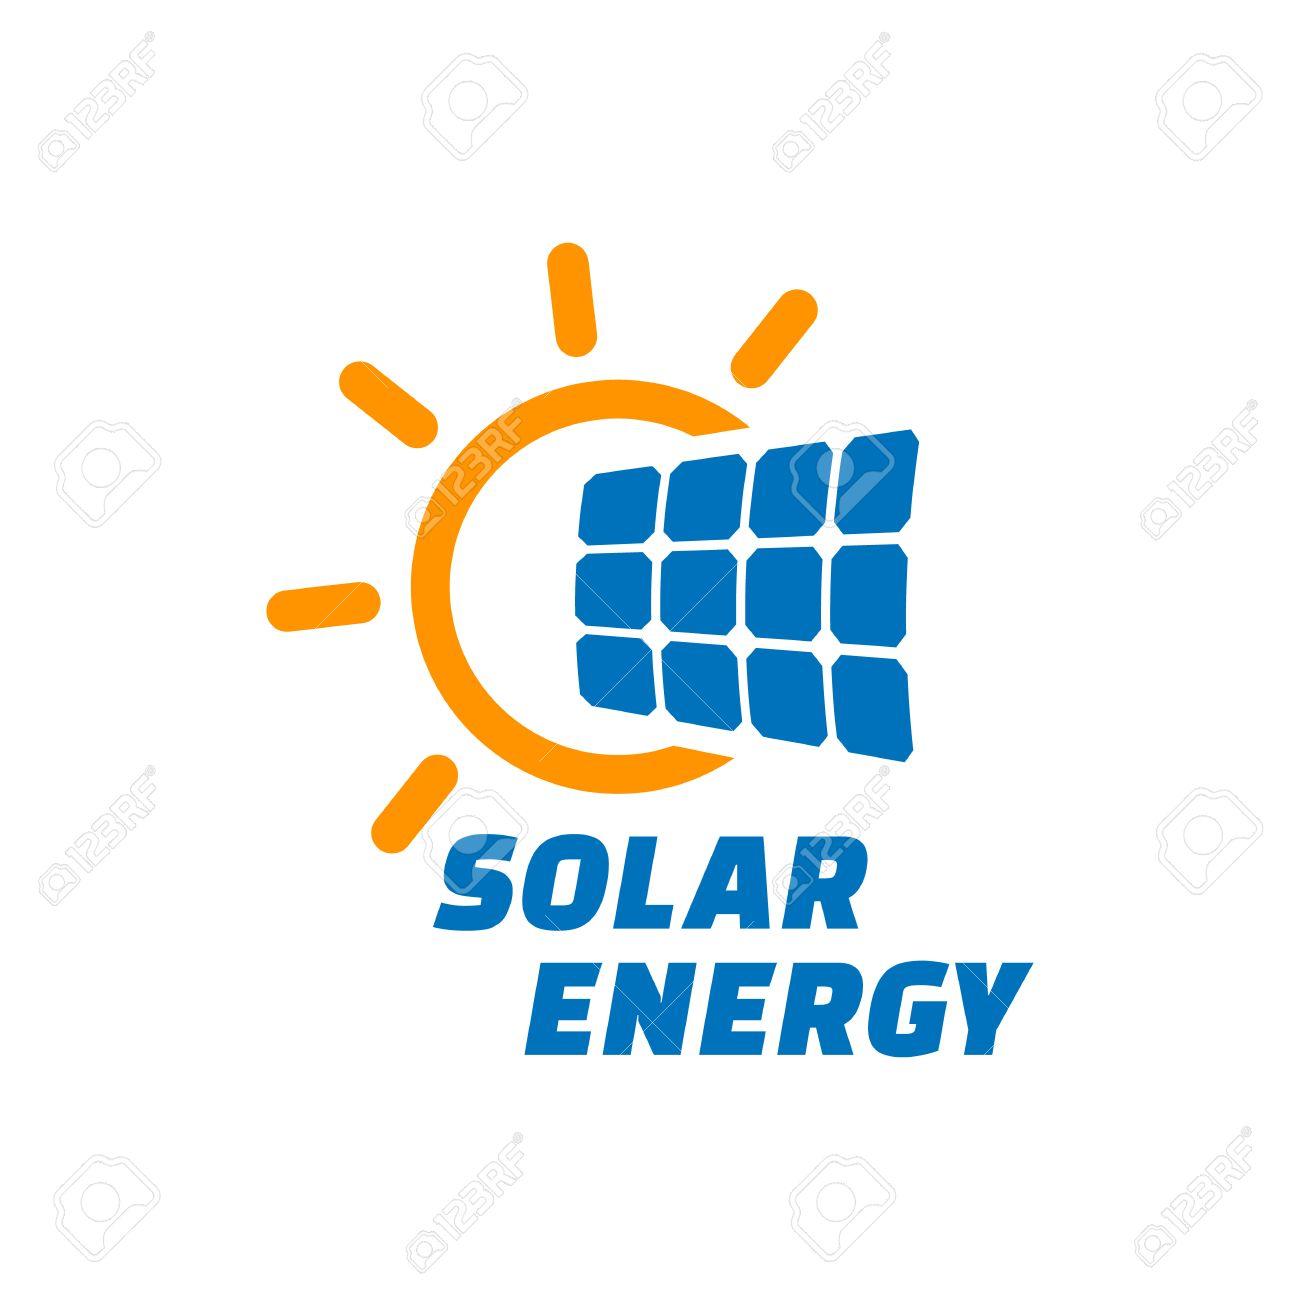 Solar energy logo or icon. Vector solar panel sign. - 61841548